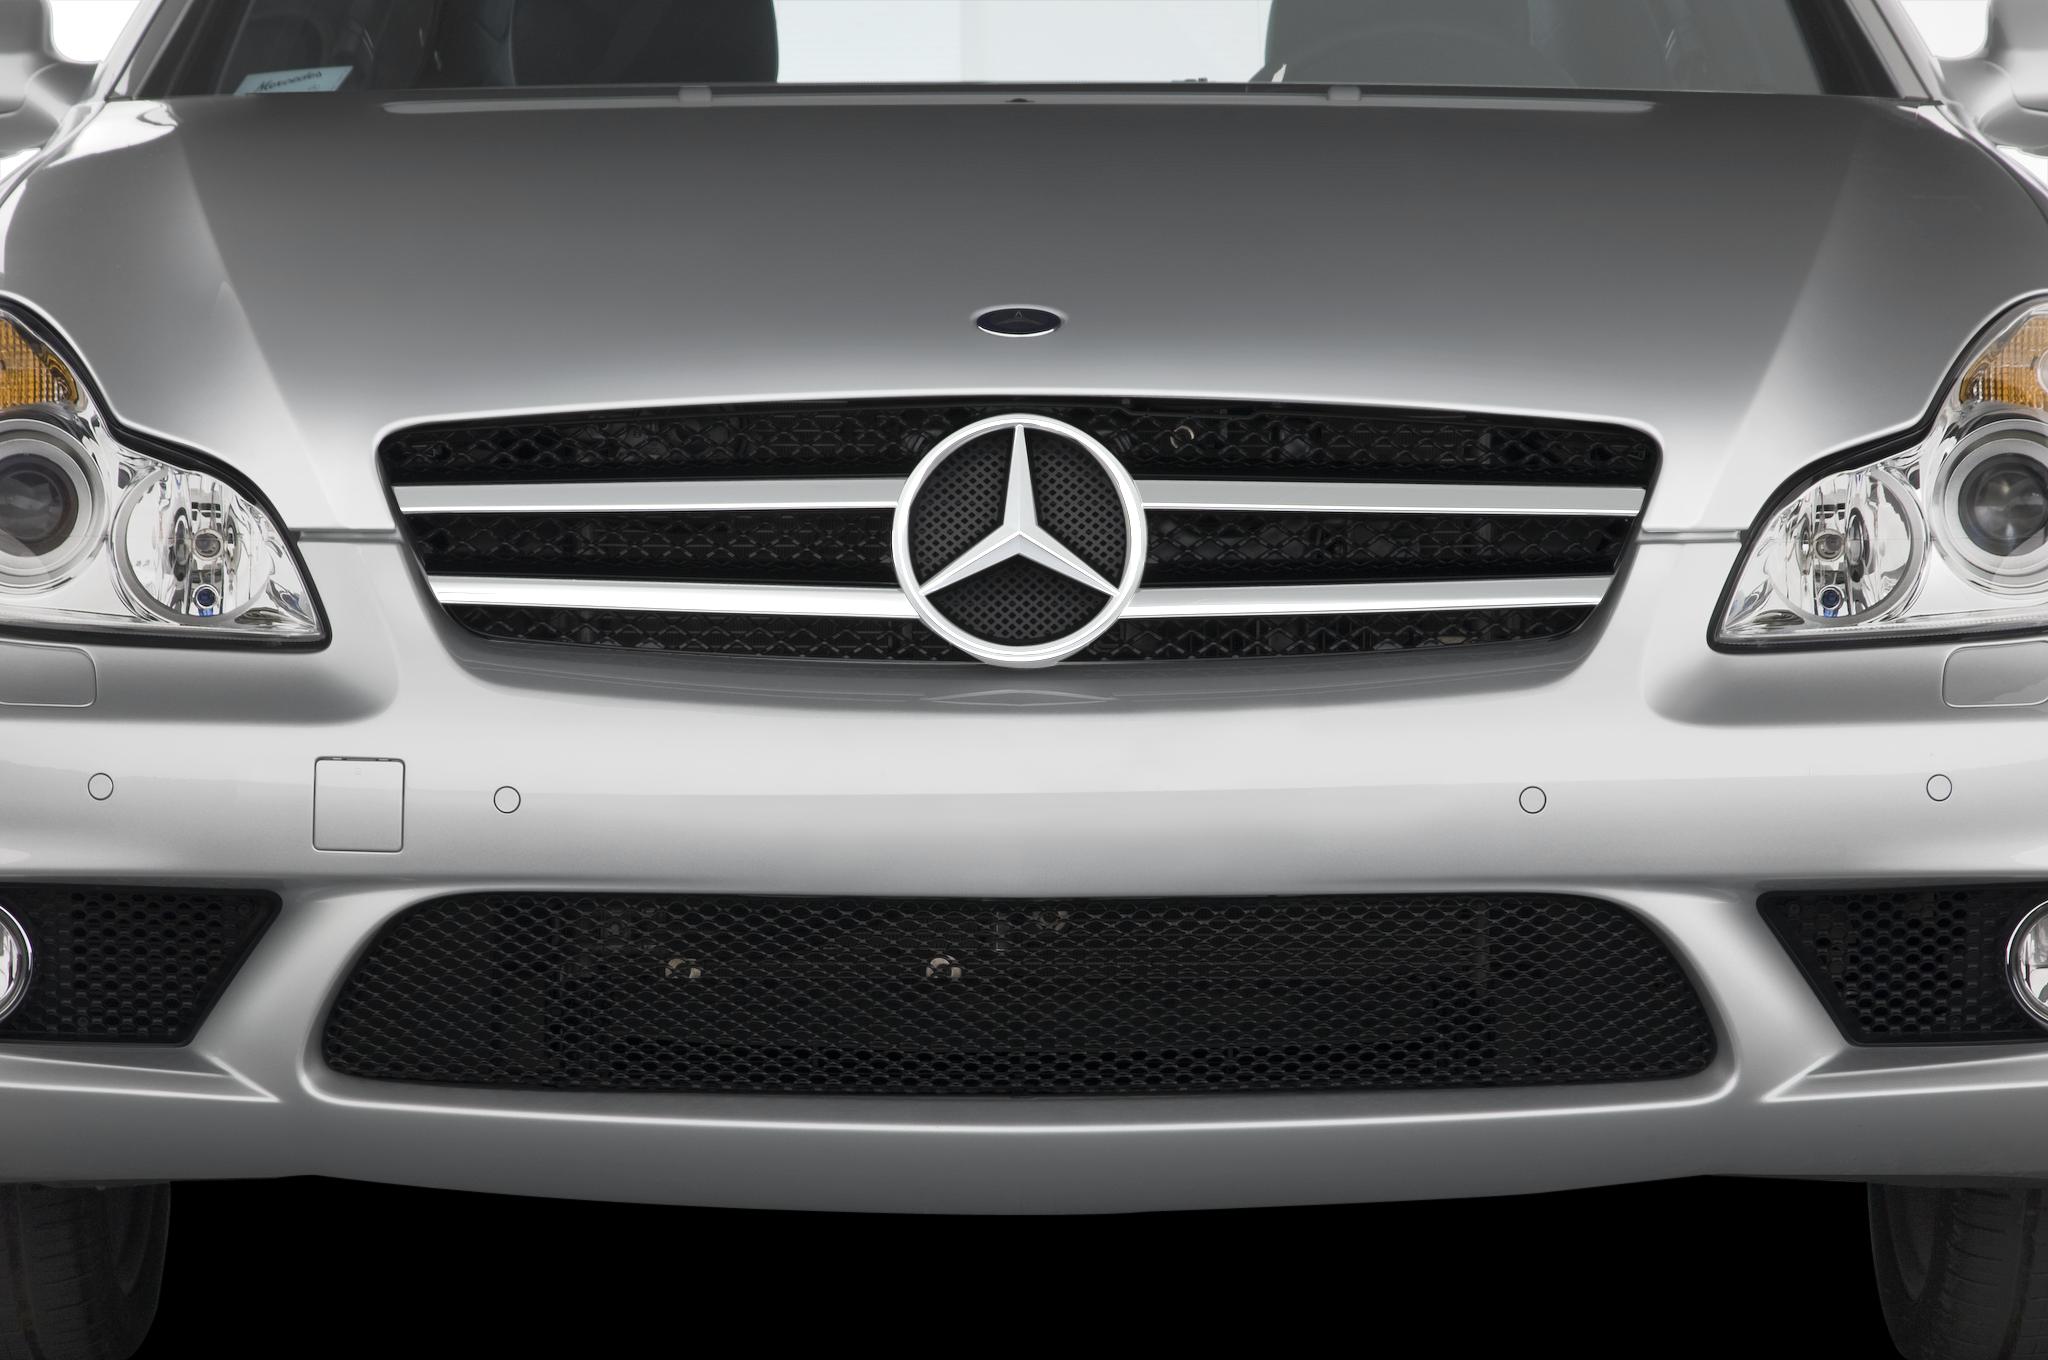 2011-Mercedes-Benz-CLS 2011-mercedes-benz-cls-class-cls63-amg-coupe ...